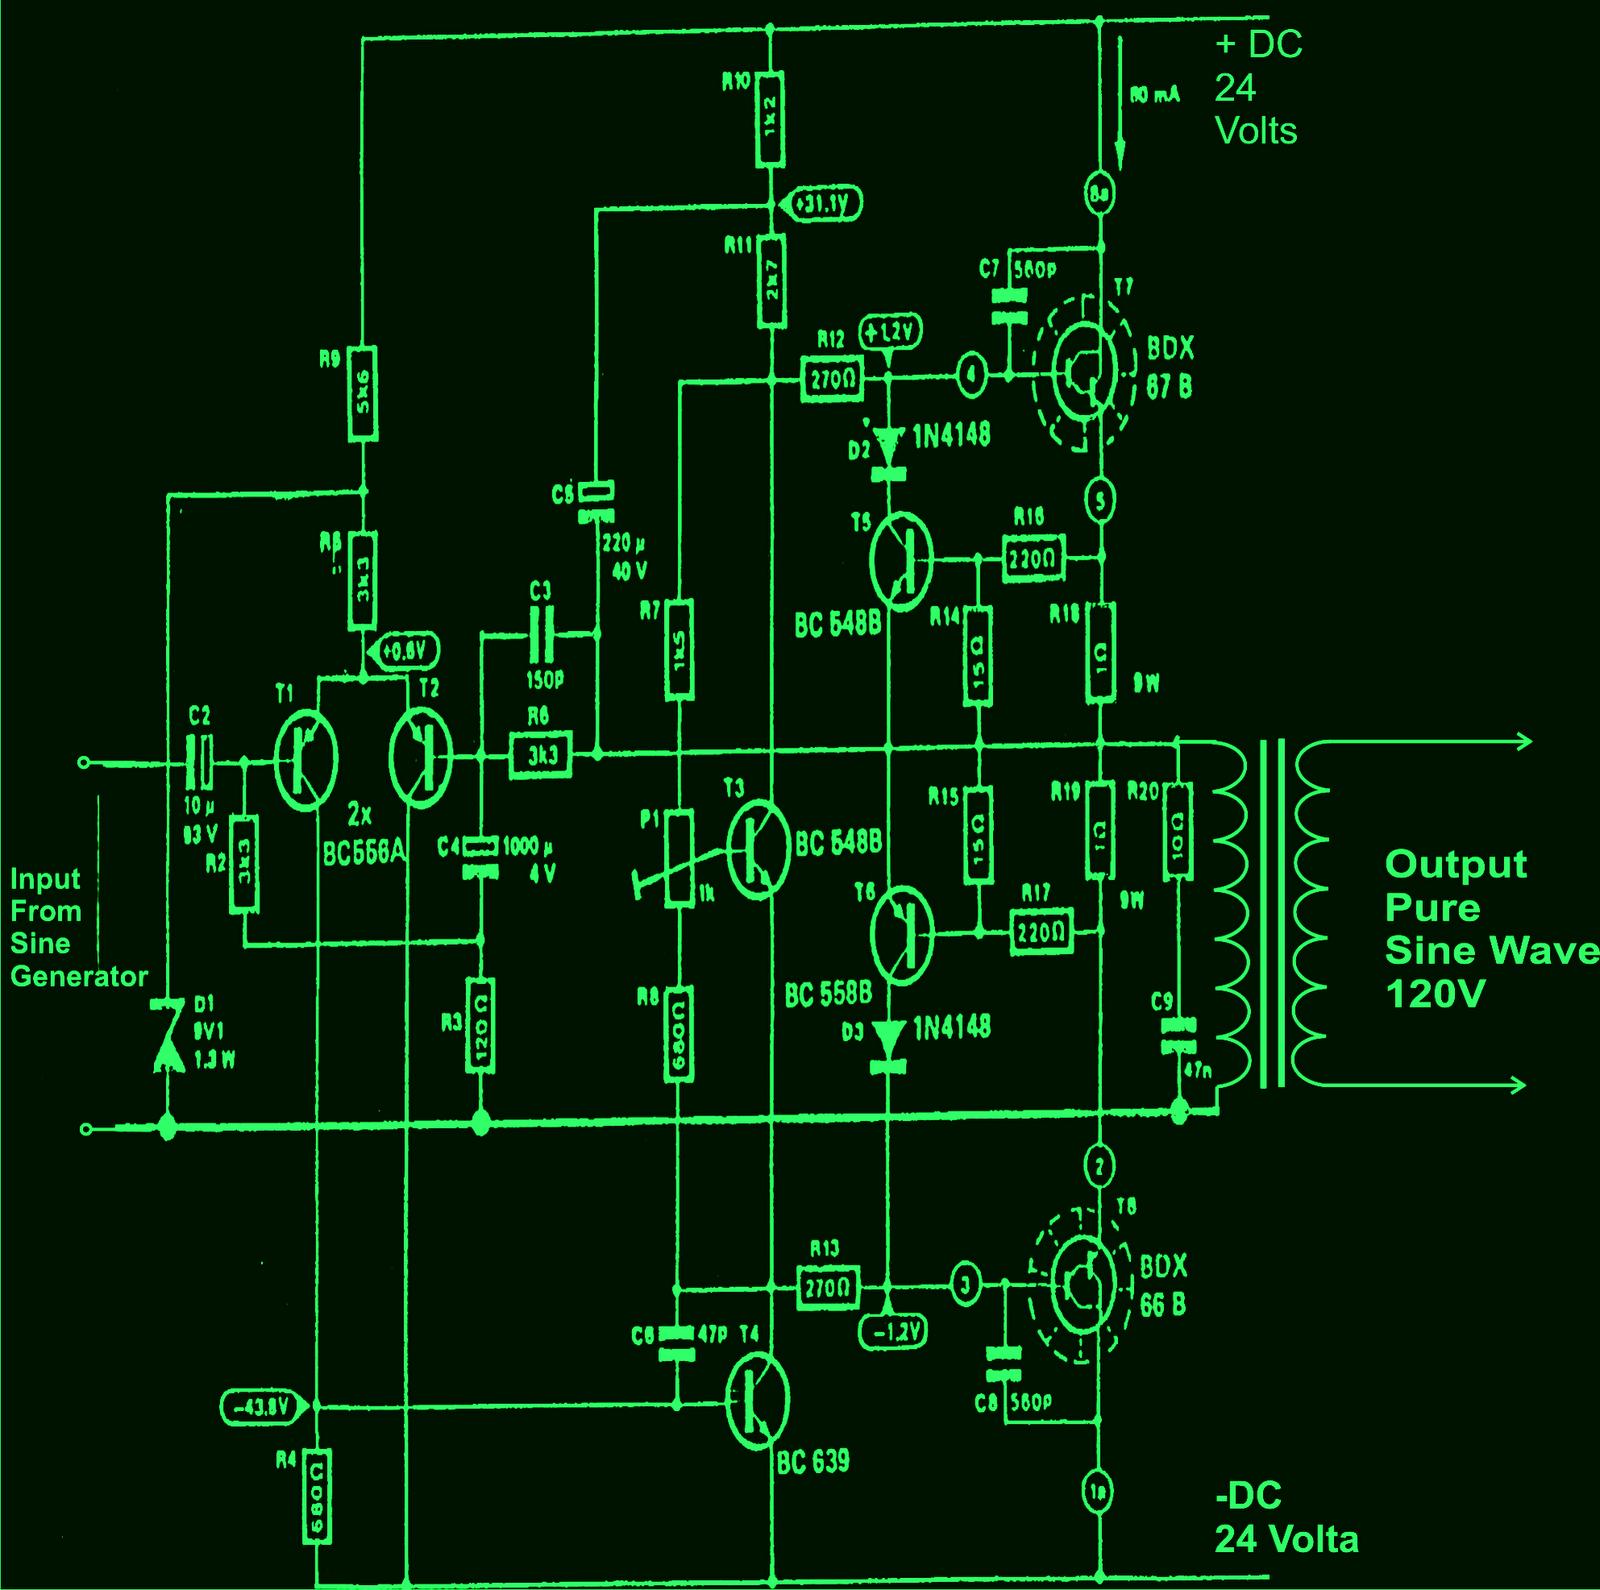 Armtech Hybrid Battery Isolator 1287 as well Question 35614 further Wiring Diagram Ignition Coil in addition 12volt 24volt Dc Dc Konvertor Devresi Buz11 together with Lm3915 Entegresi Ile 10 Led Li Vu Metre Projesi. on 12 volt circuit diagram